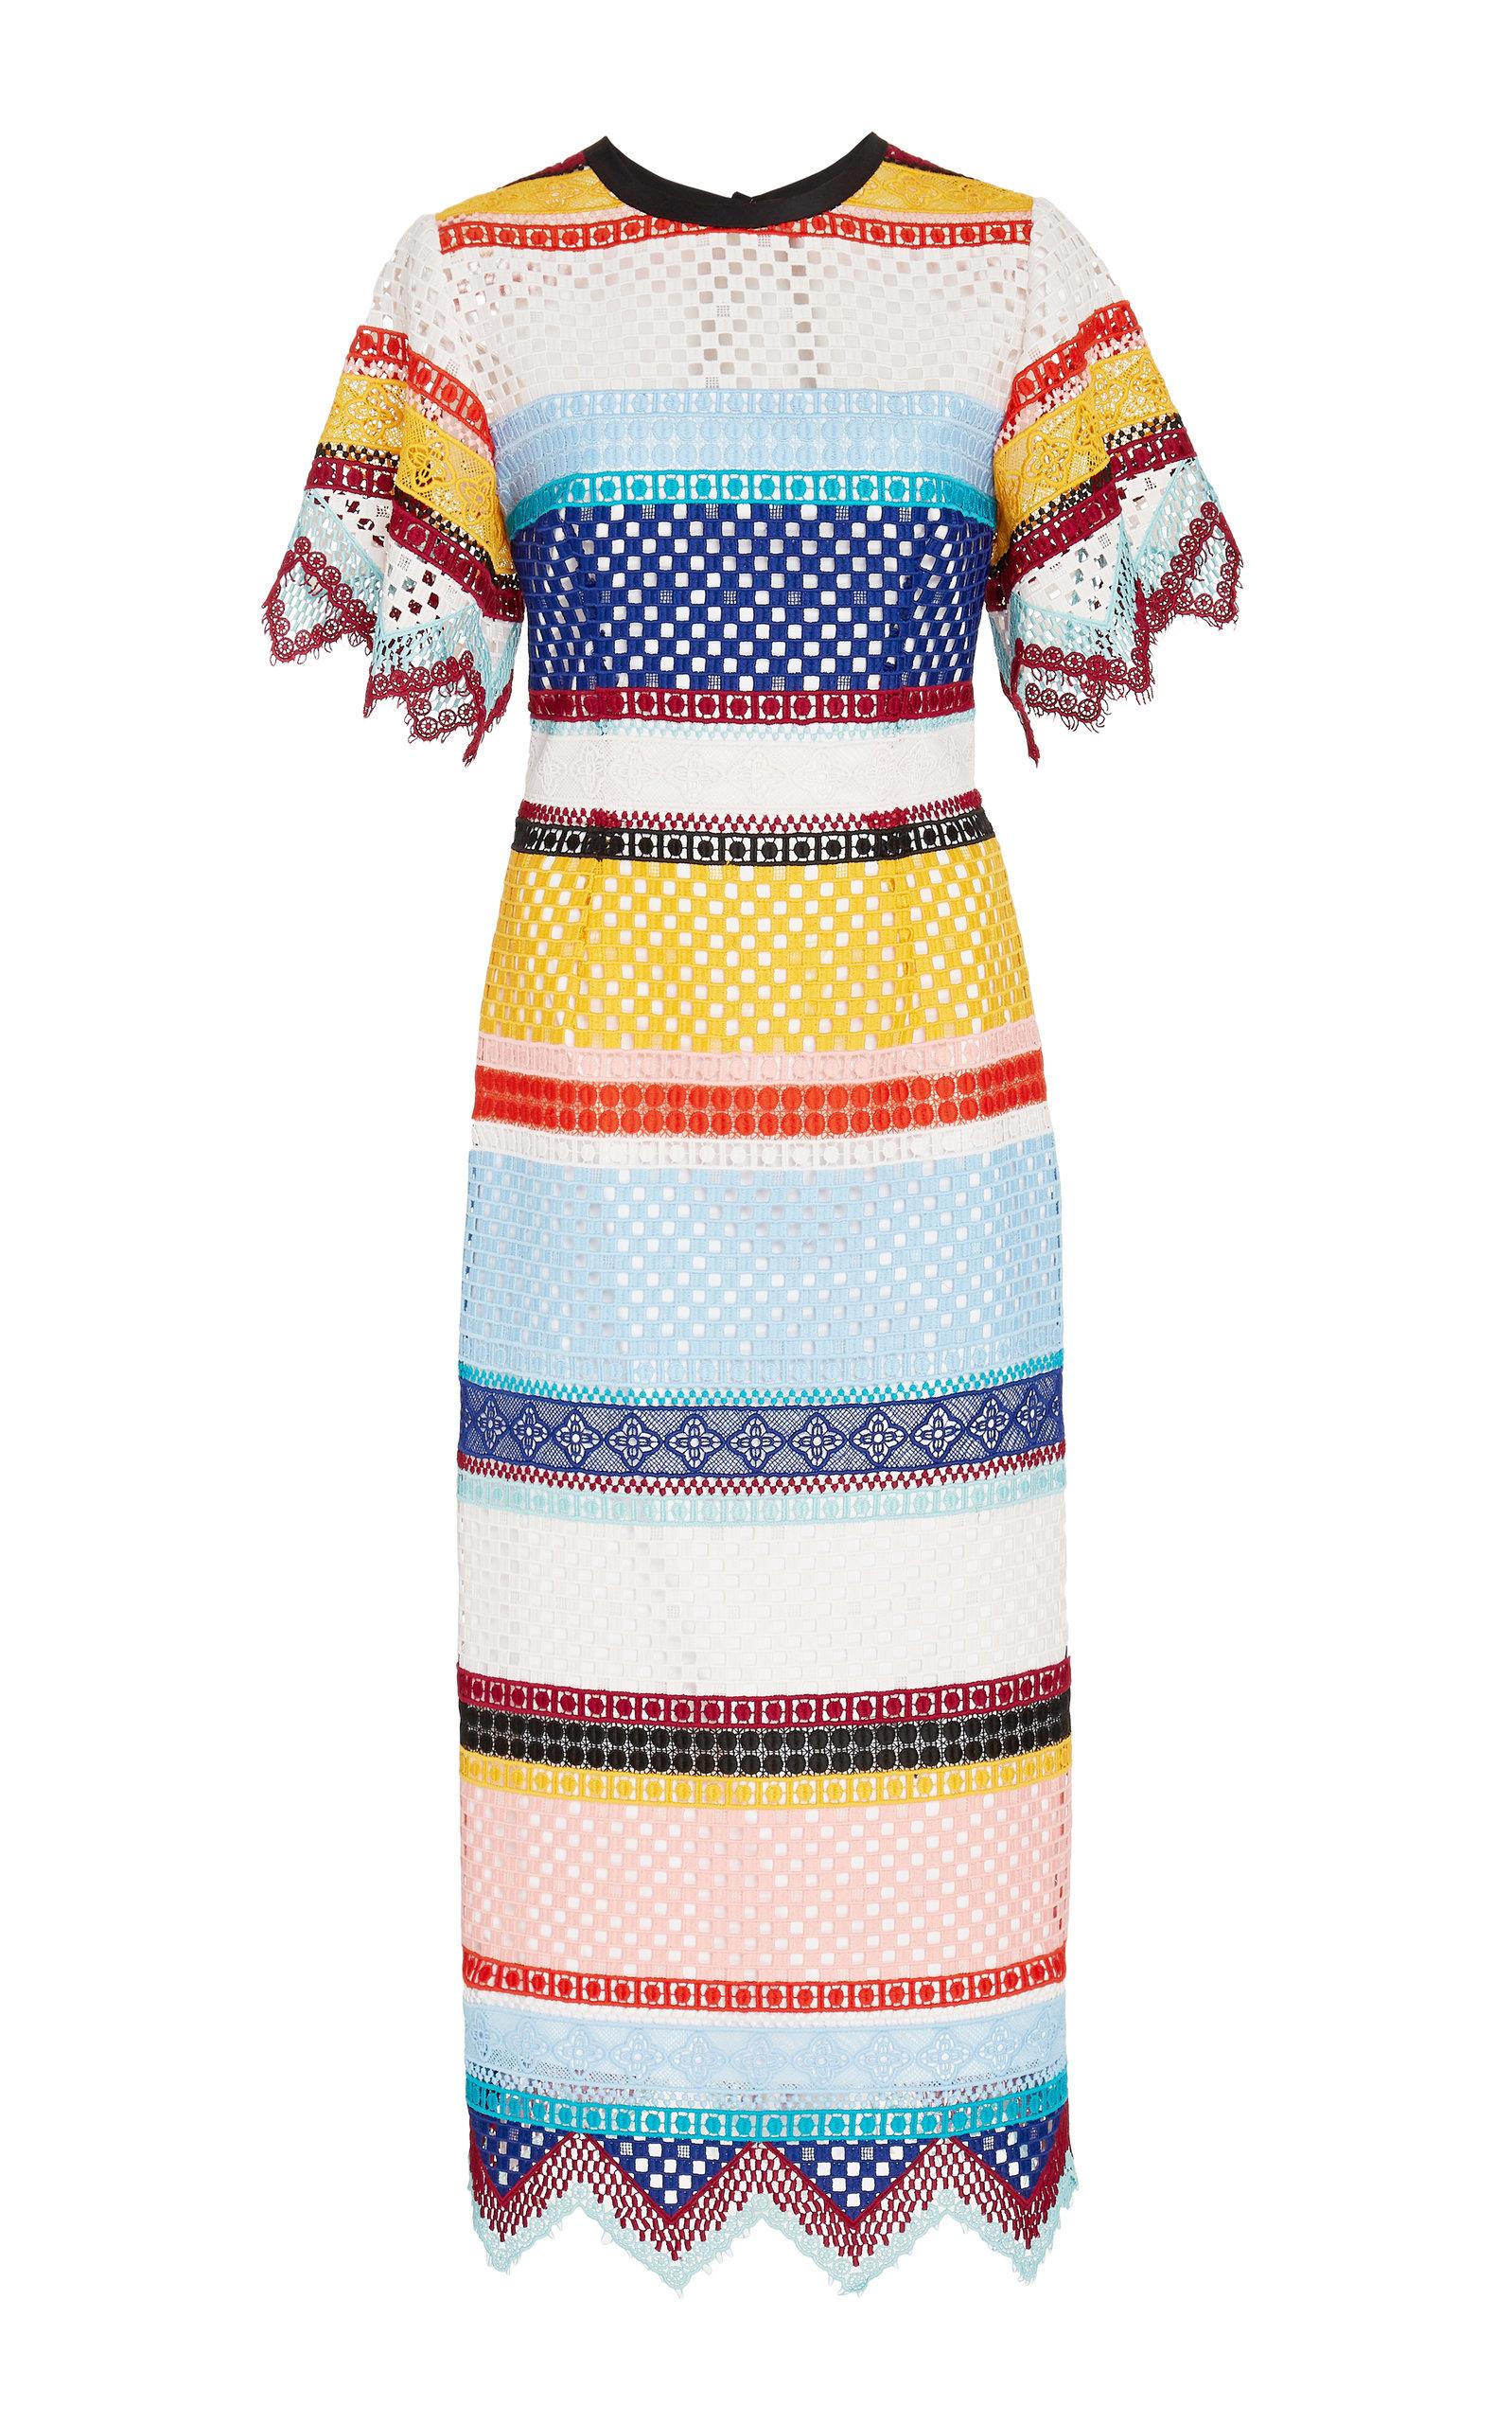 Carolina Herrera Dresses Color-Blocked Guipure Lace Dress